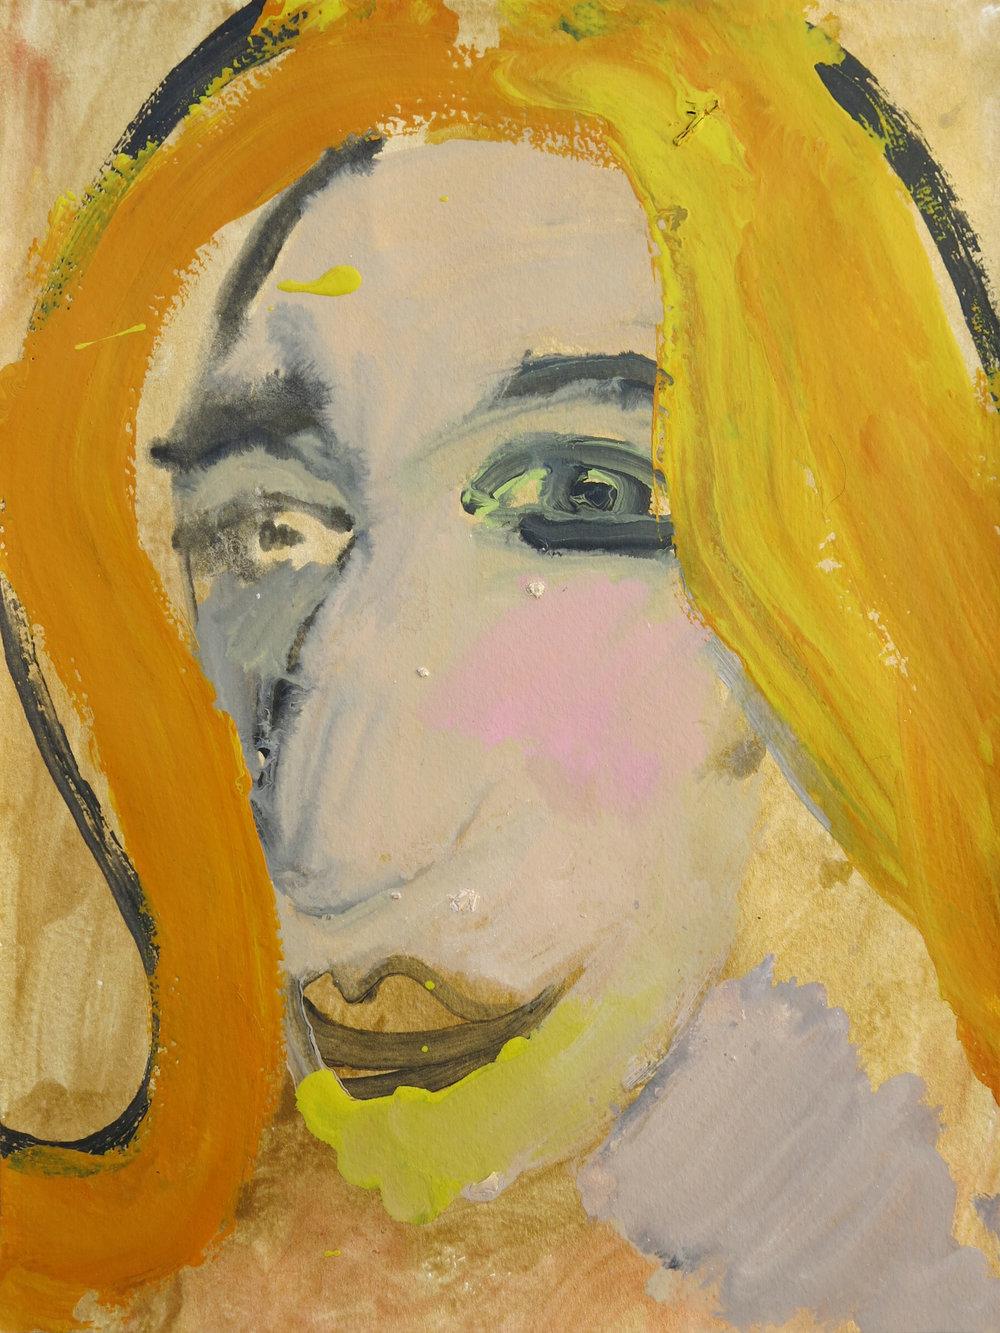 Barbra Streisand Portrait #176